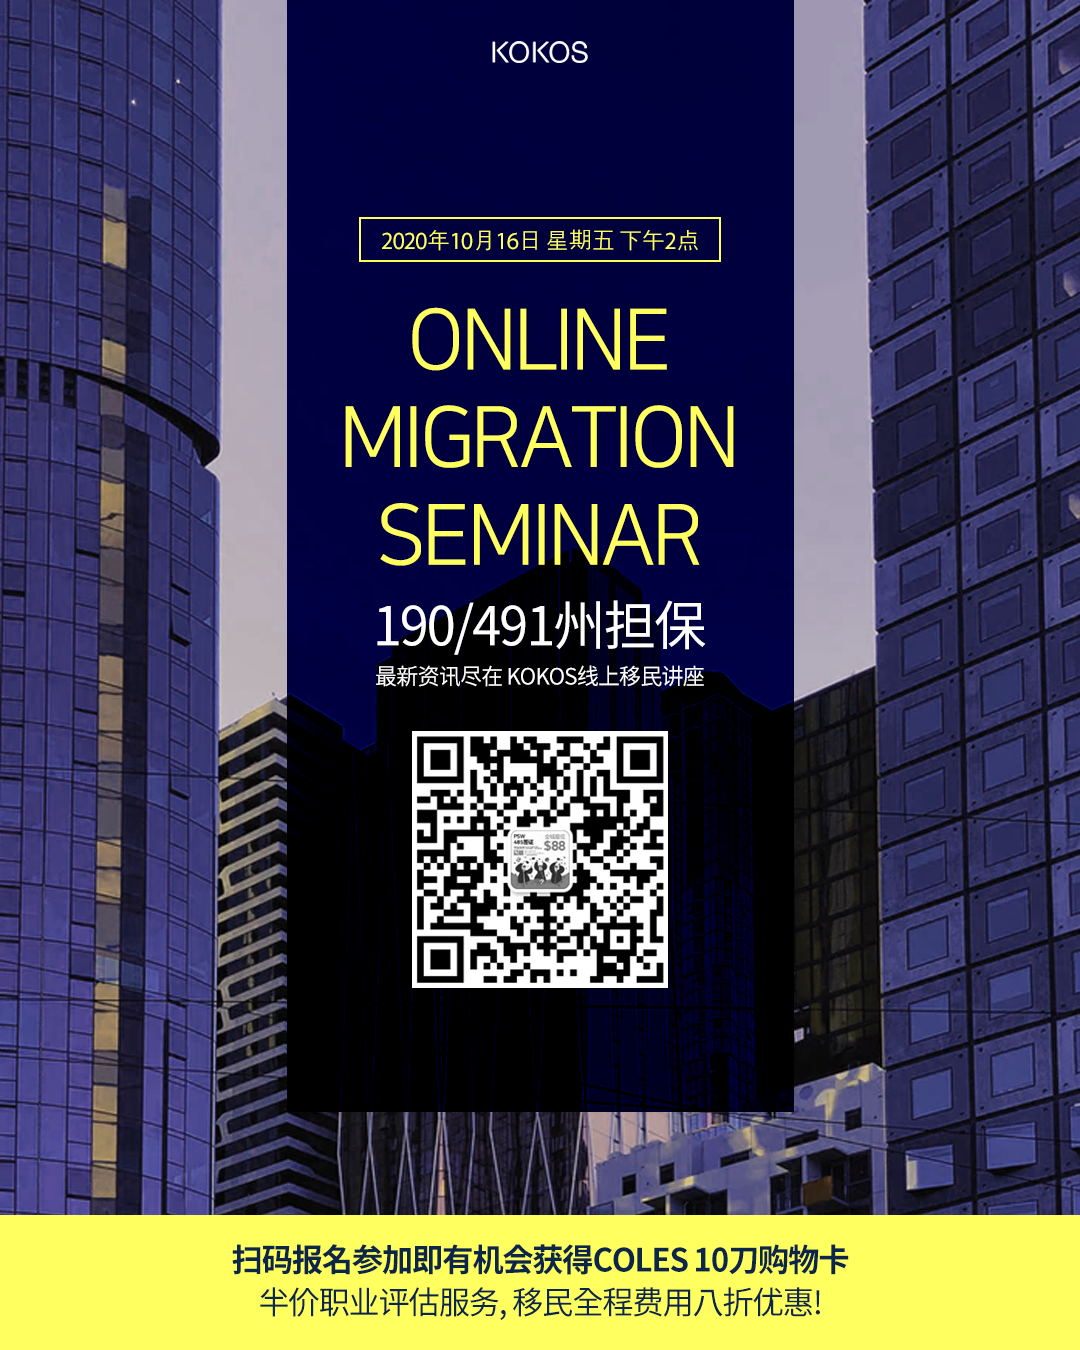 Online Migration Seminar